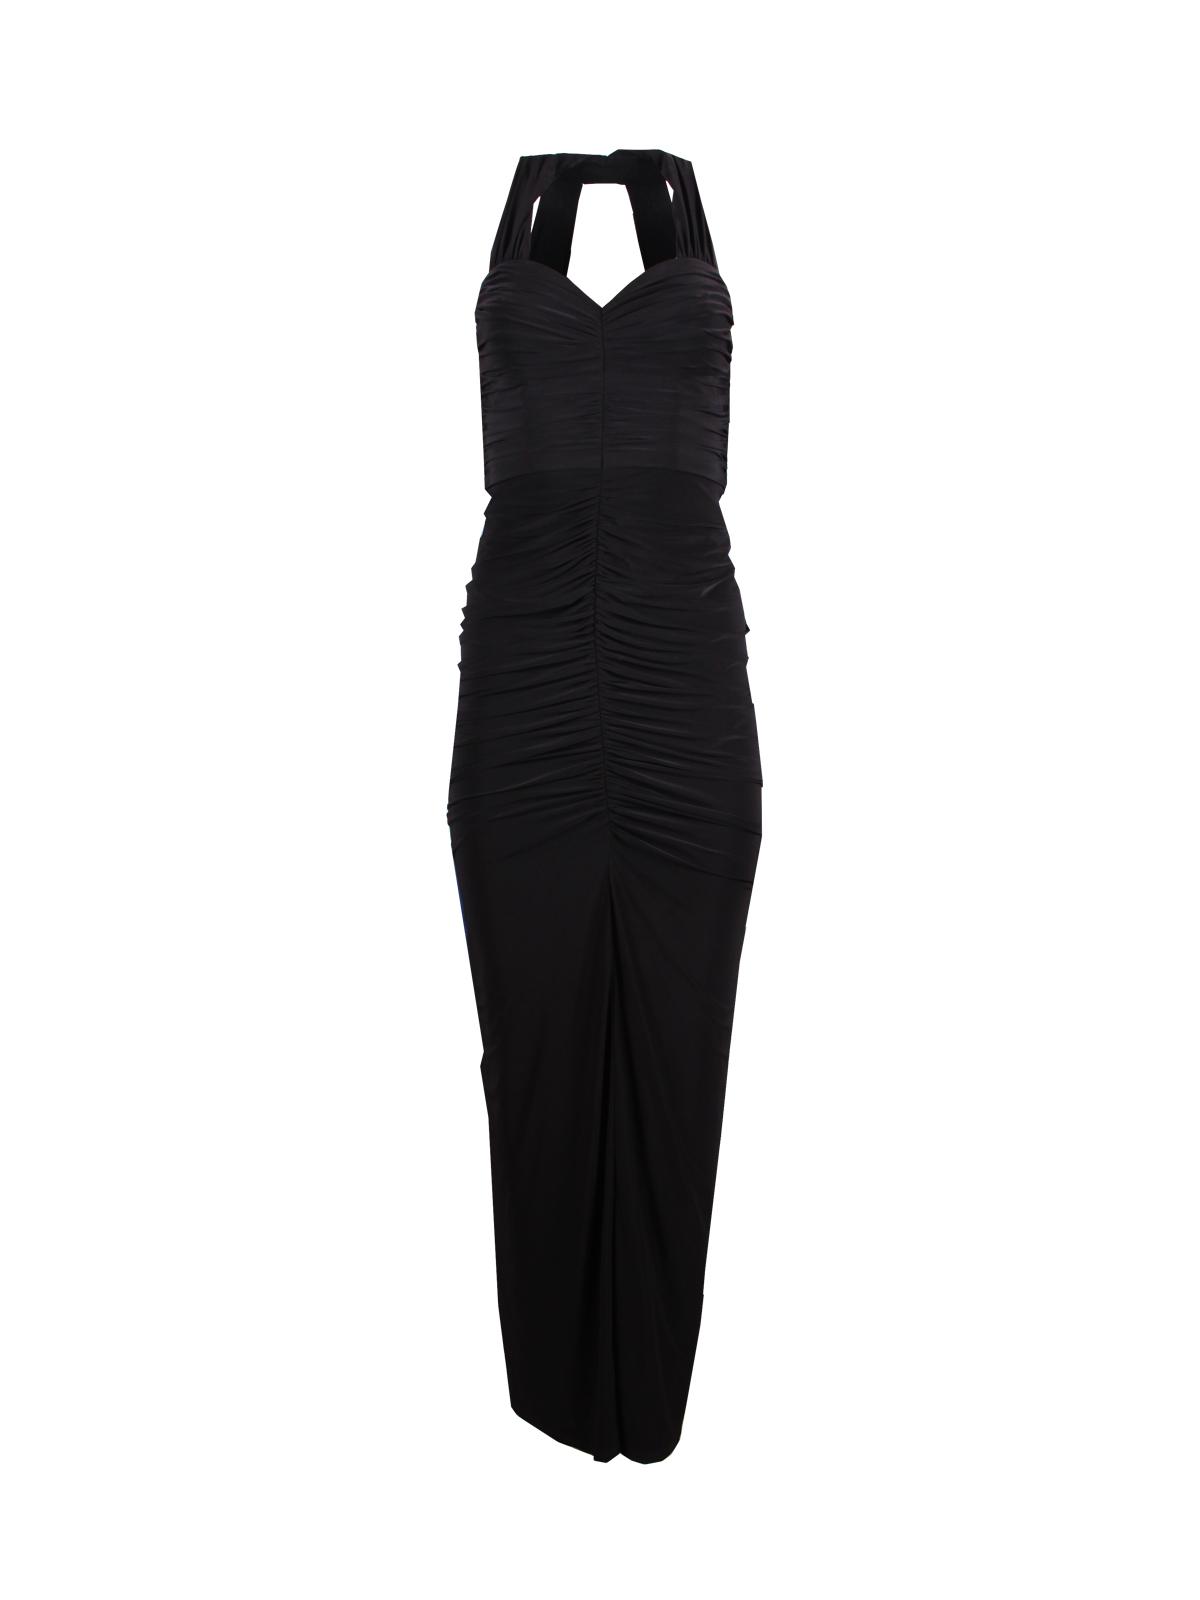 Black Halter Ruffled Jersey Gown [2] - SilkRoll